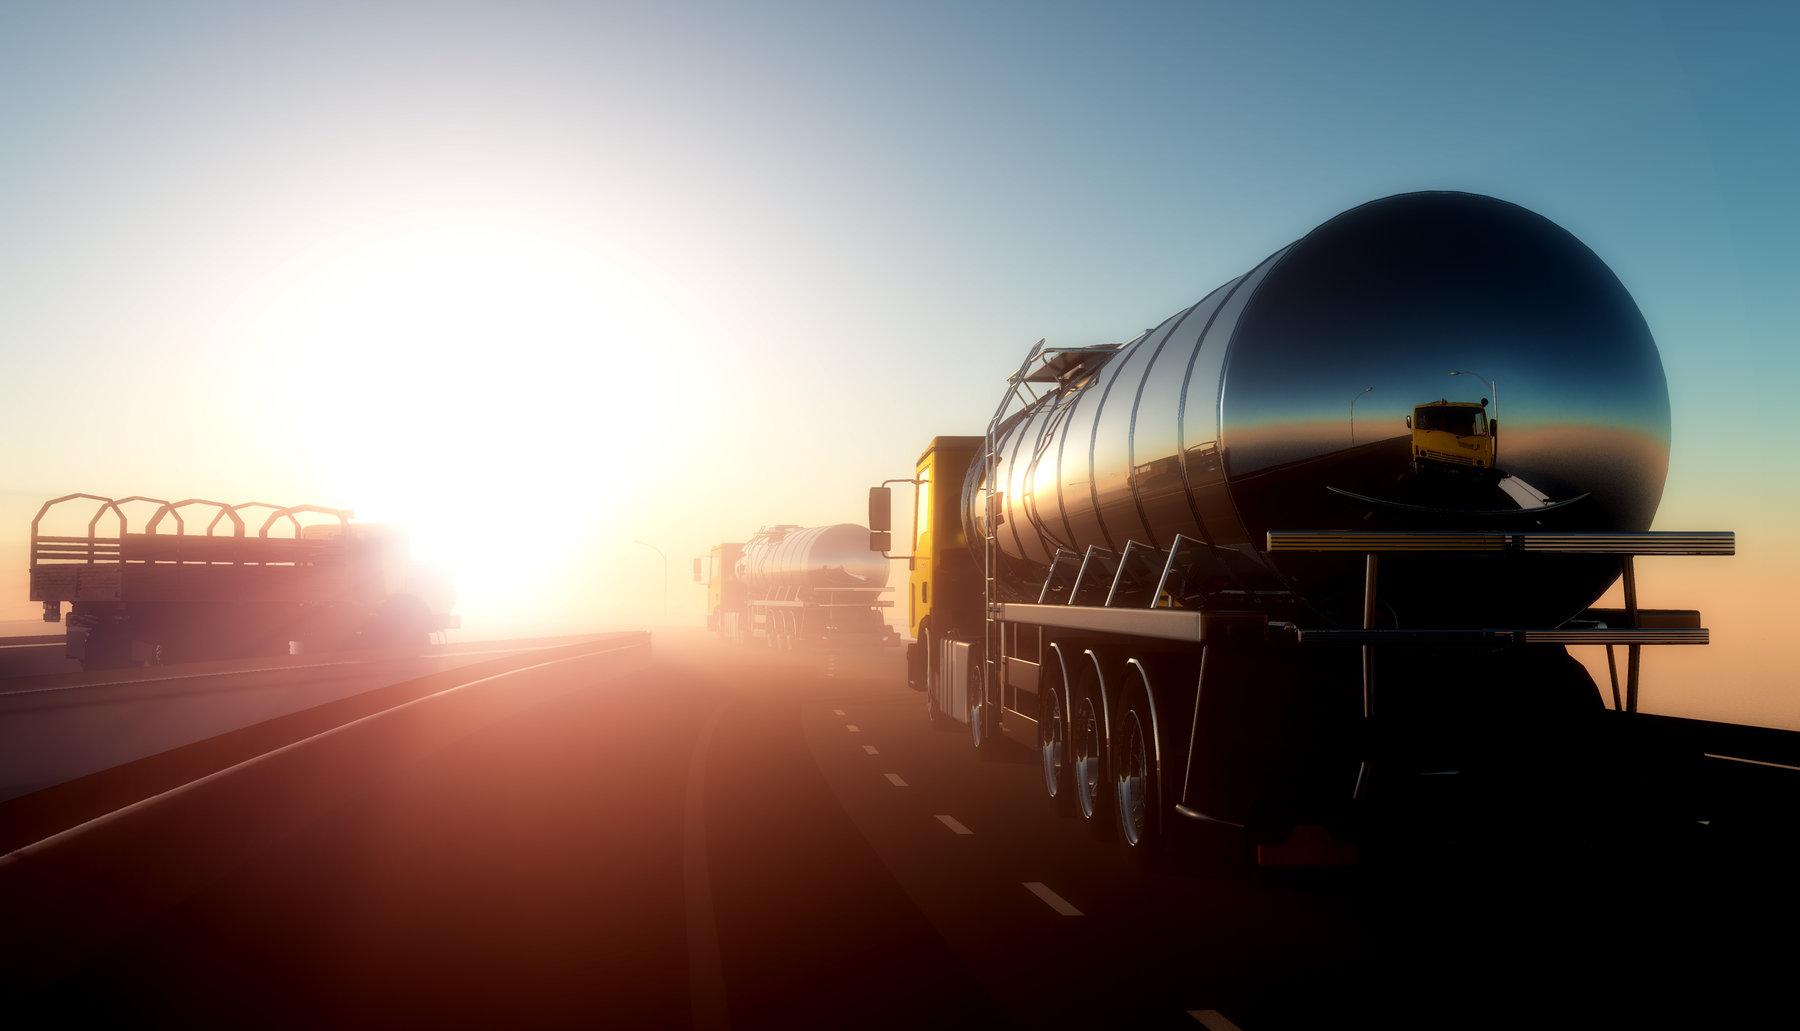 Prices of Kerosene, Diesel rise in April 2019 – NBS